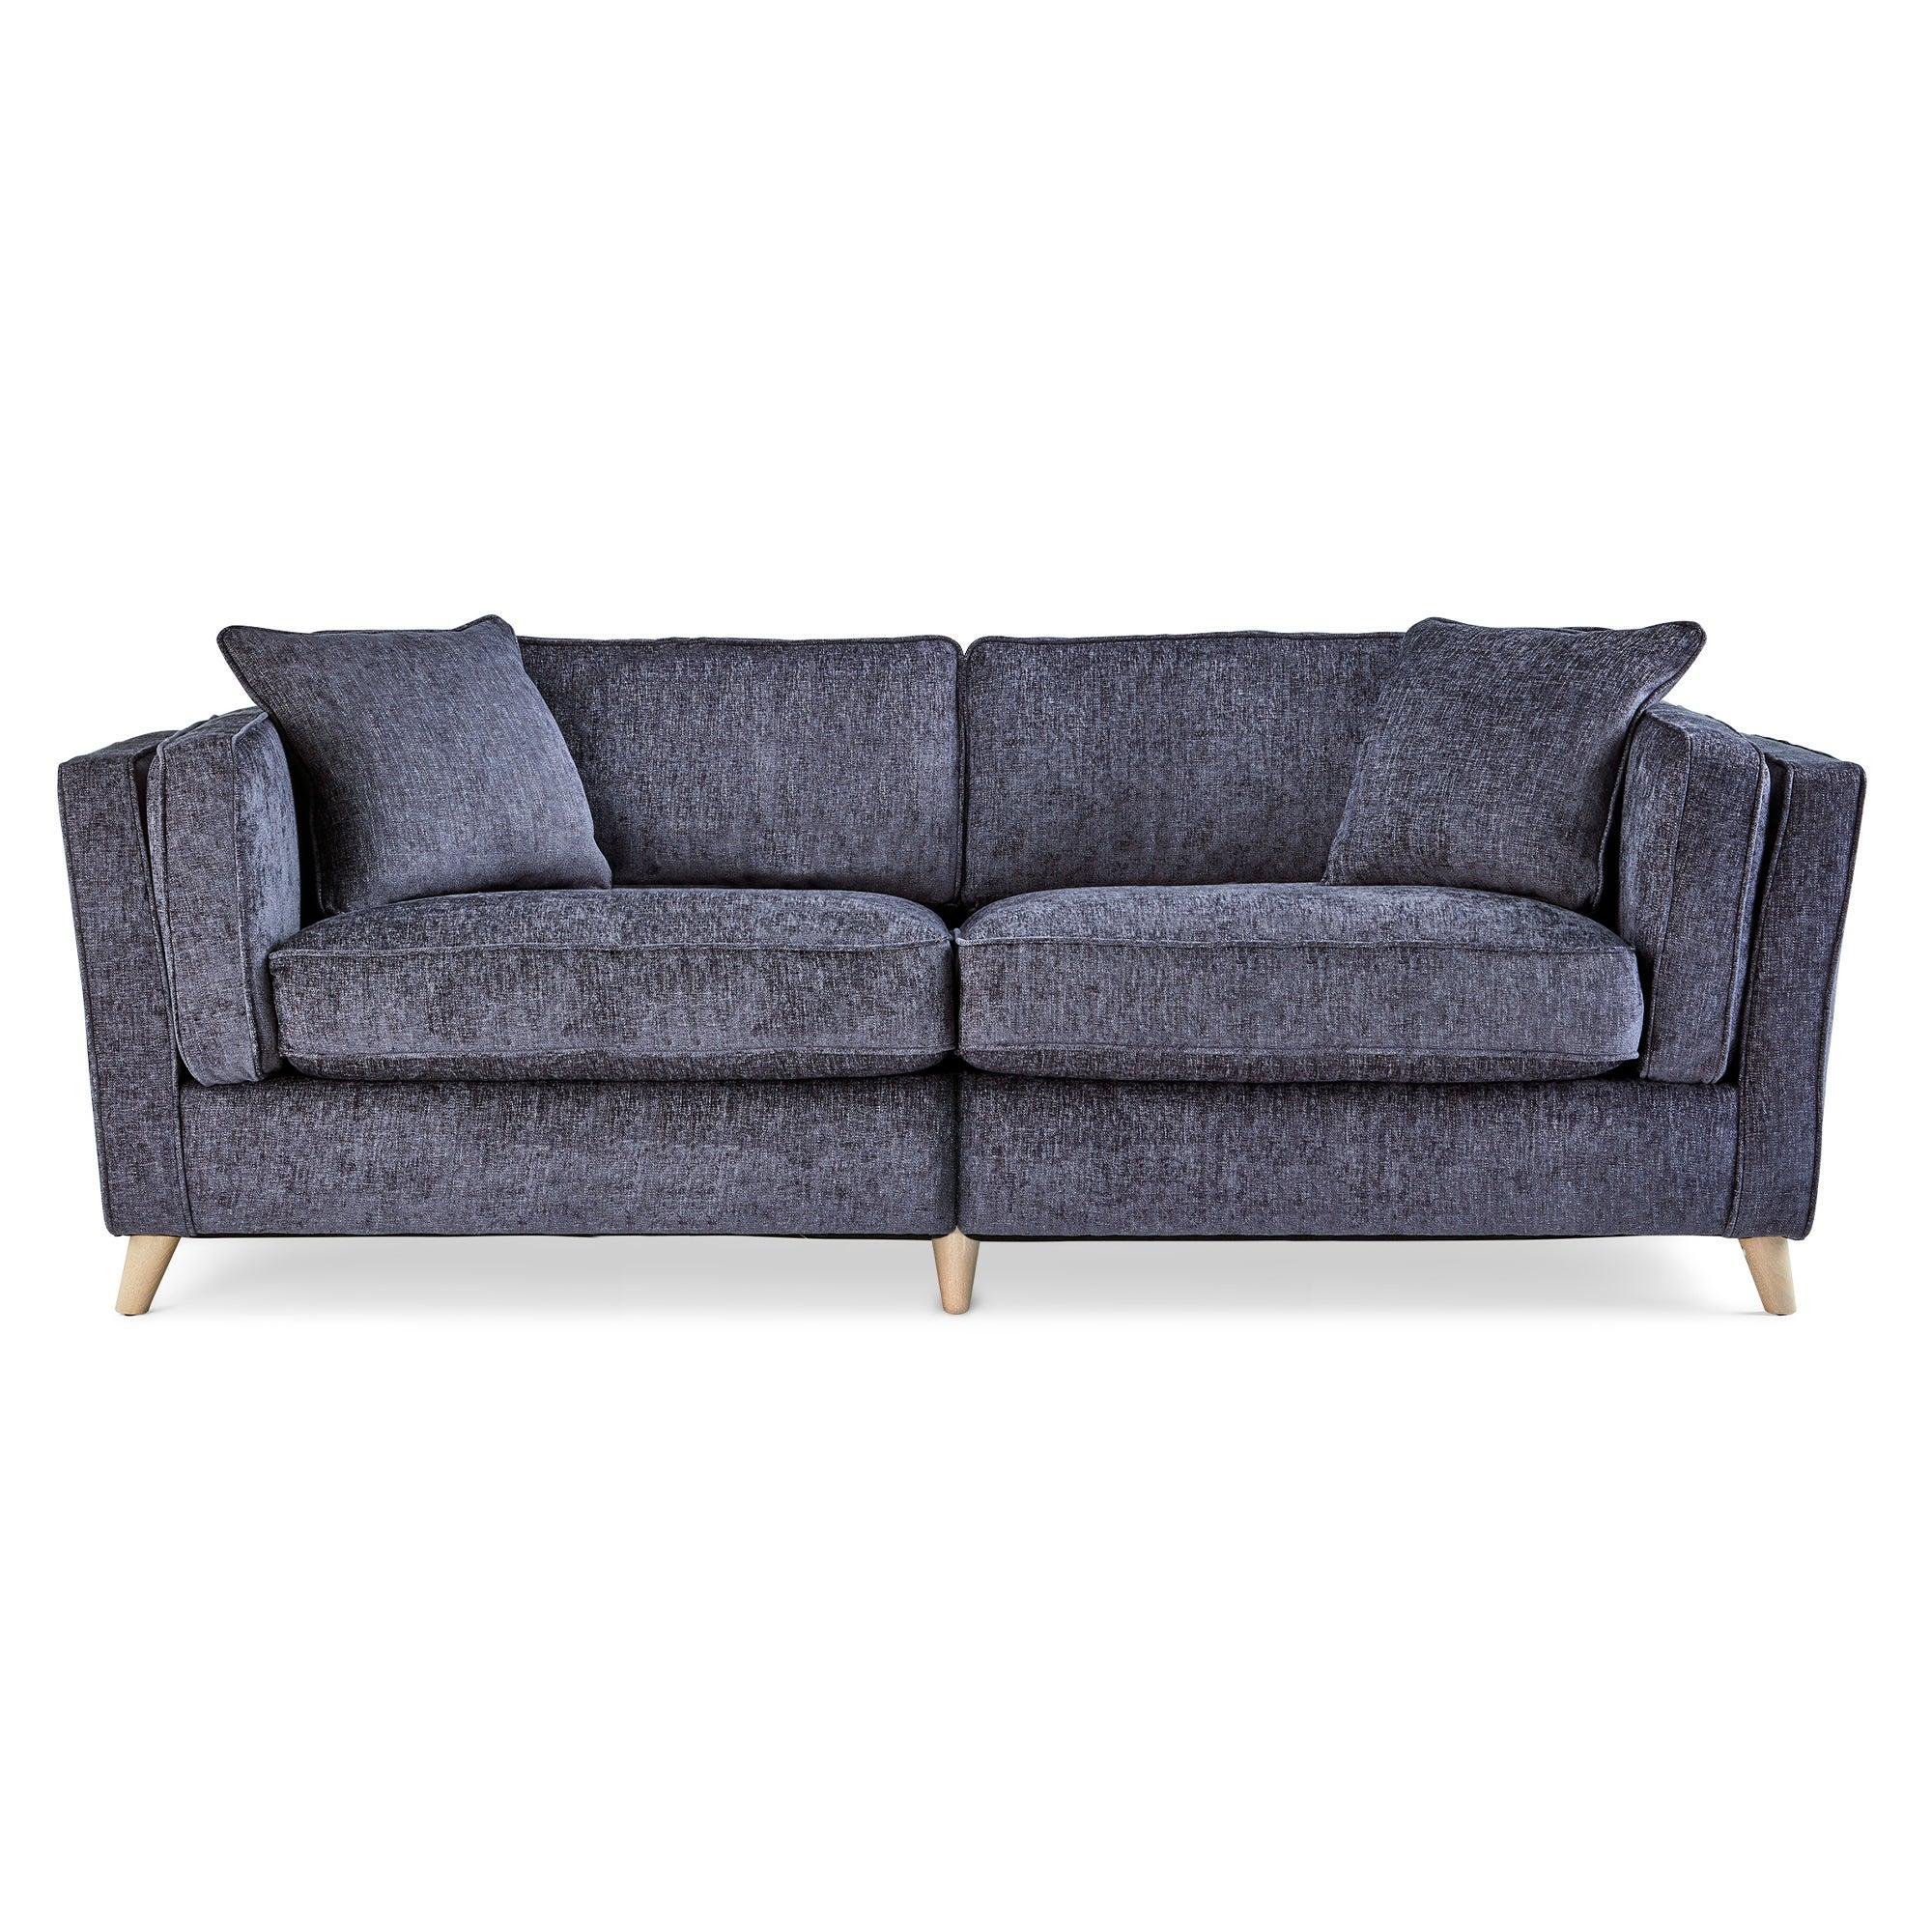 Arabella 4 Seater Sofa Luxury Chenille Navy Blue